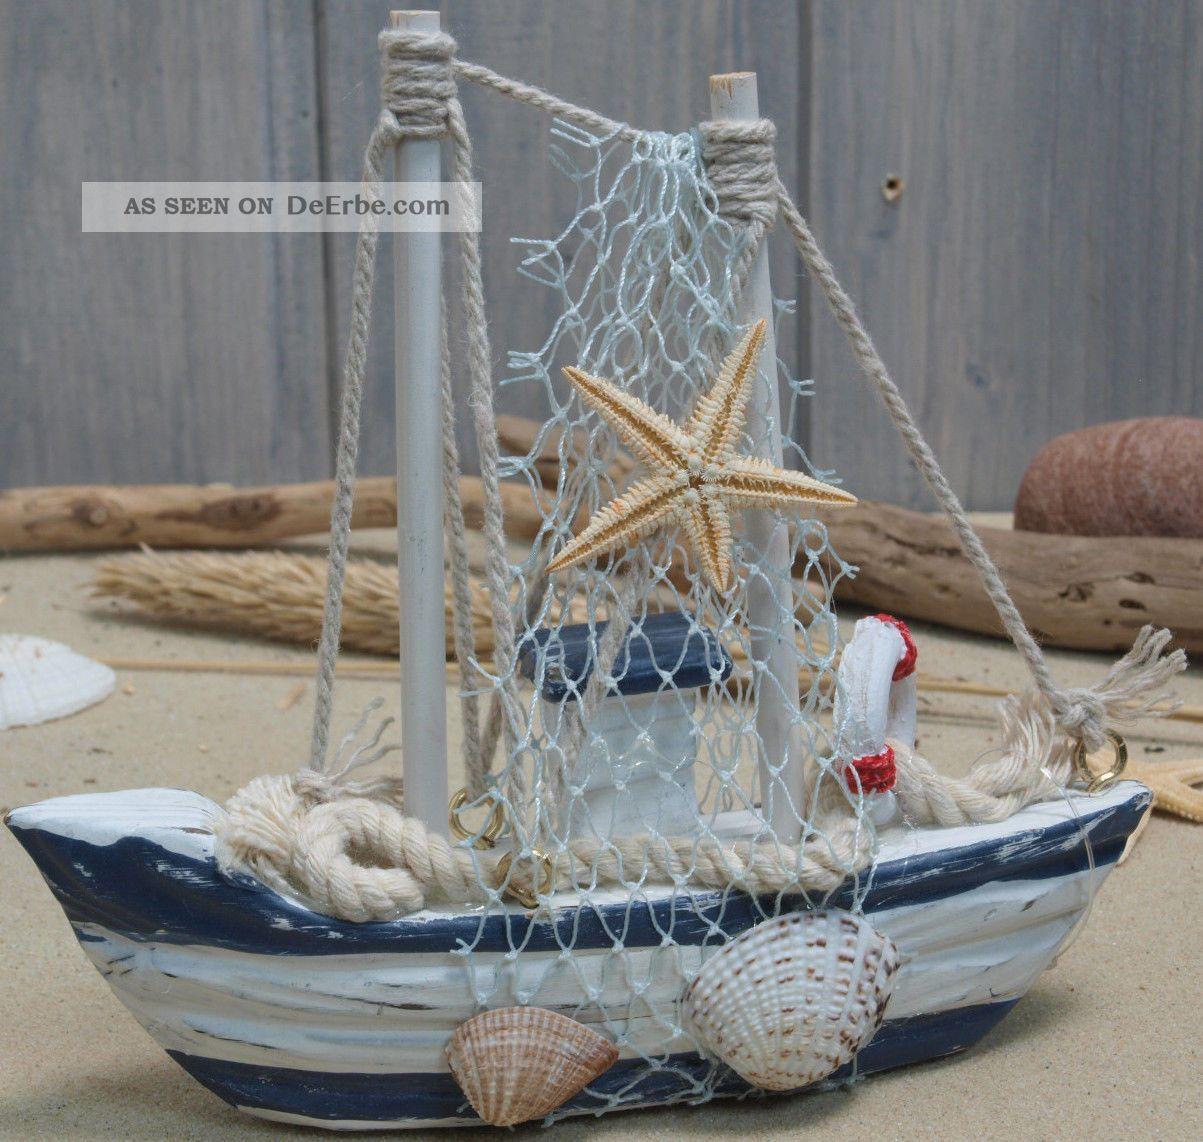 Fischerboot aus holz mit fangnetz bad deko 12 5x12cm - Maritime deko ...